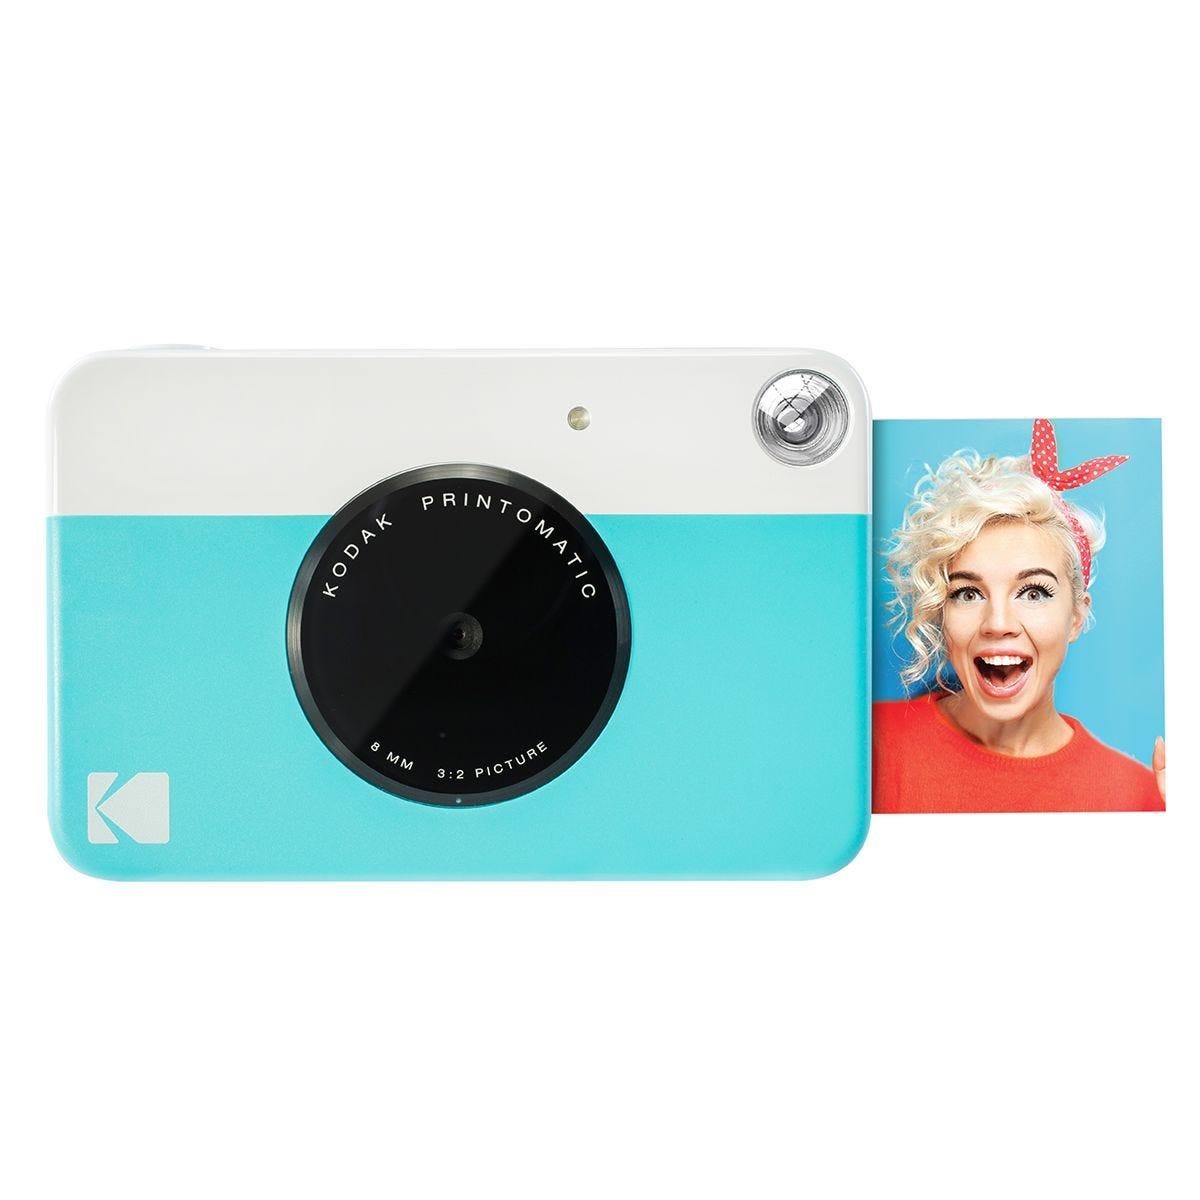 Kodak Printomatic Instant Digital Camera - Blue